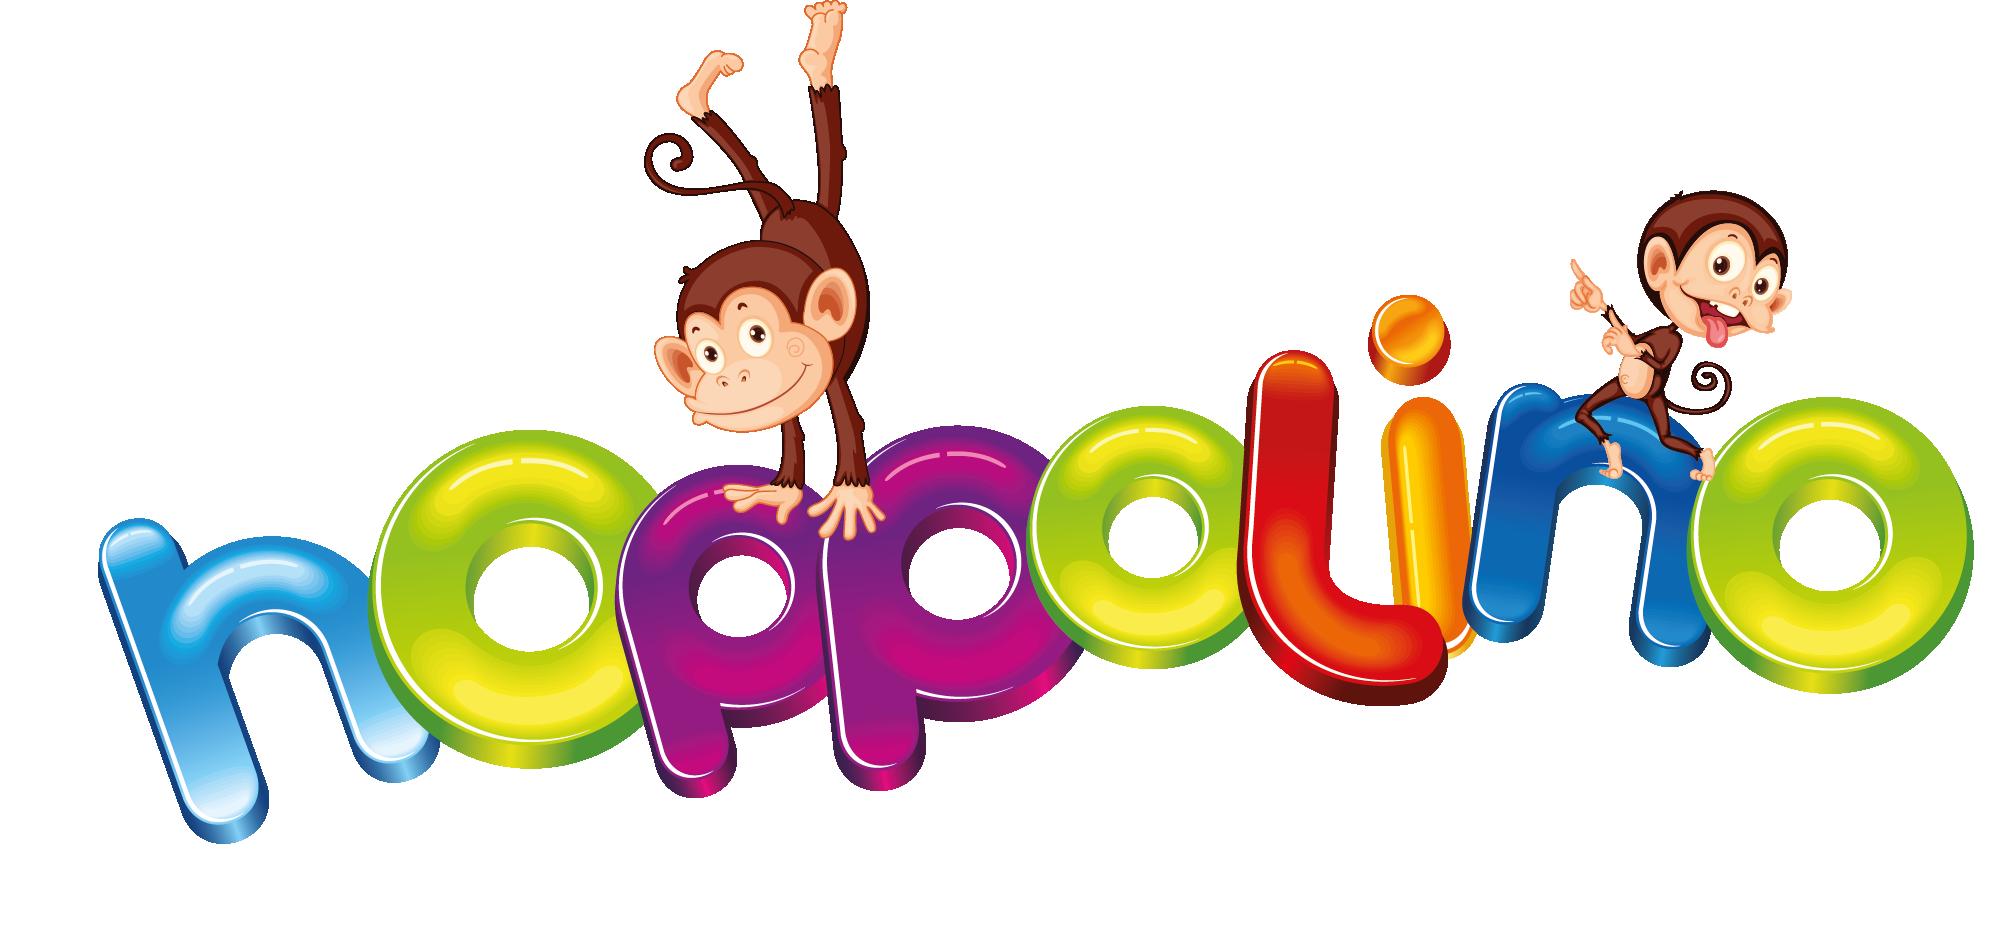 Hoppolino 1